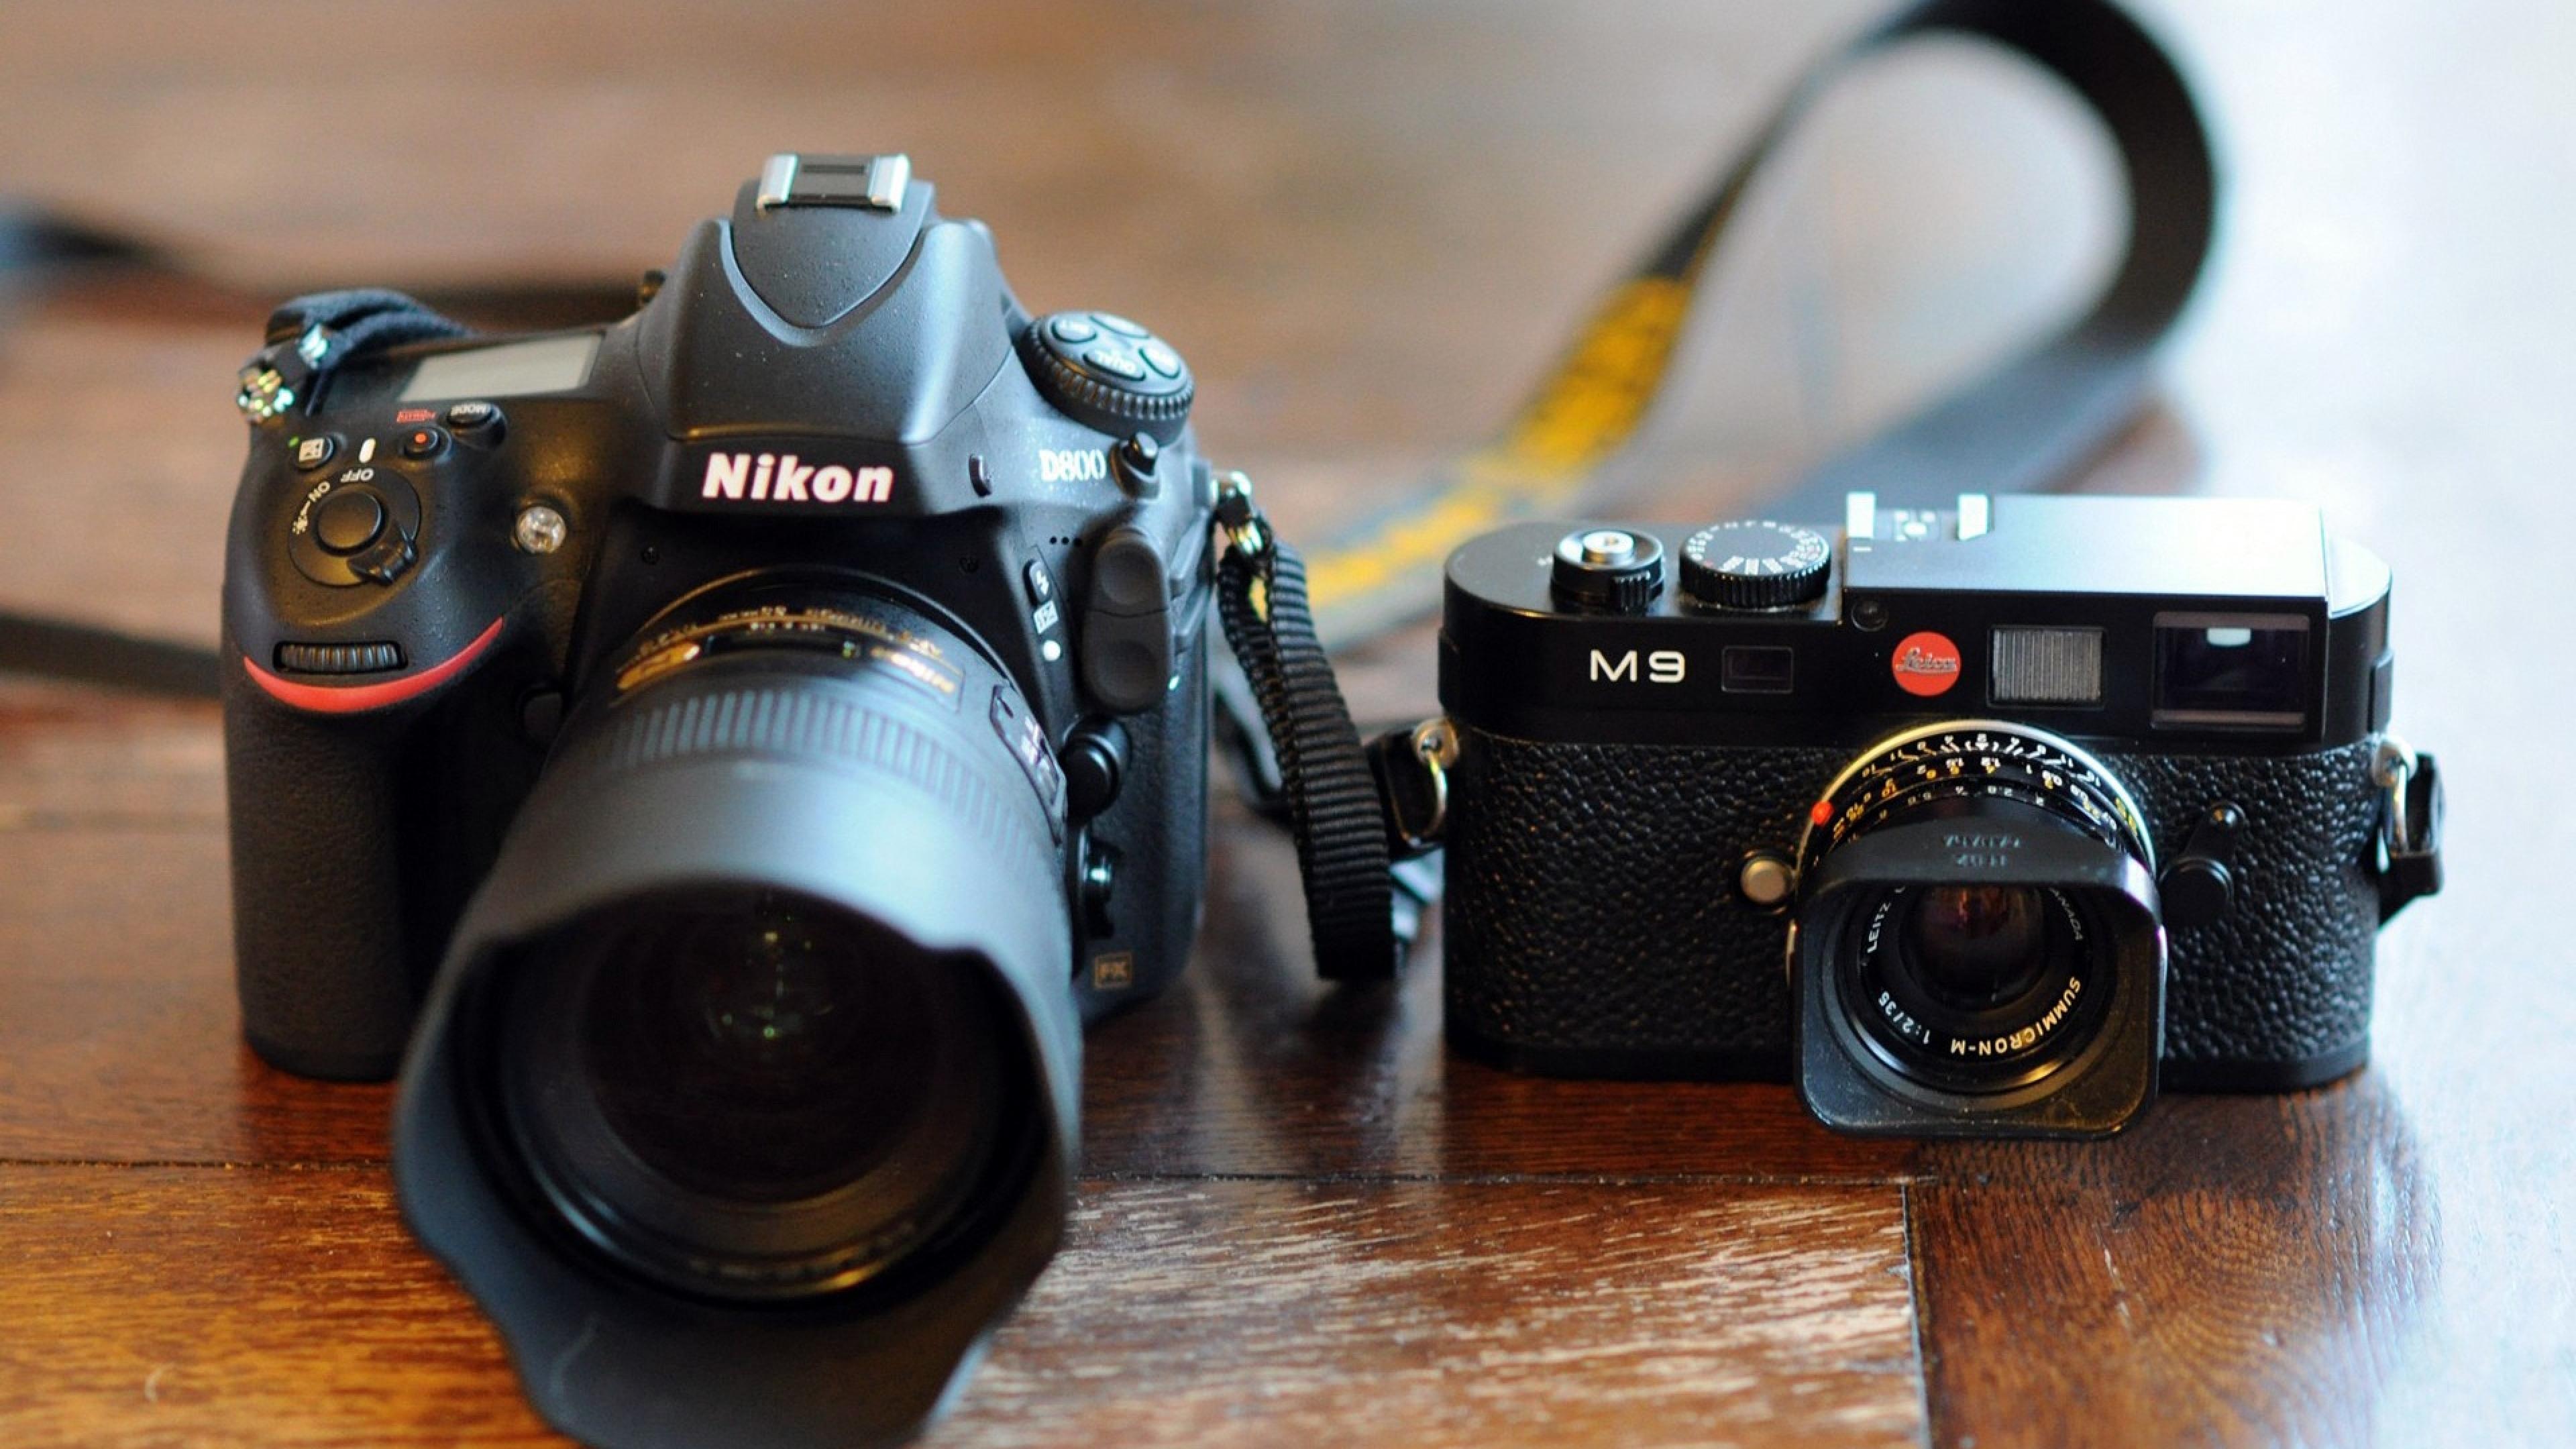 Borsa per fotocamera nikon 100